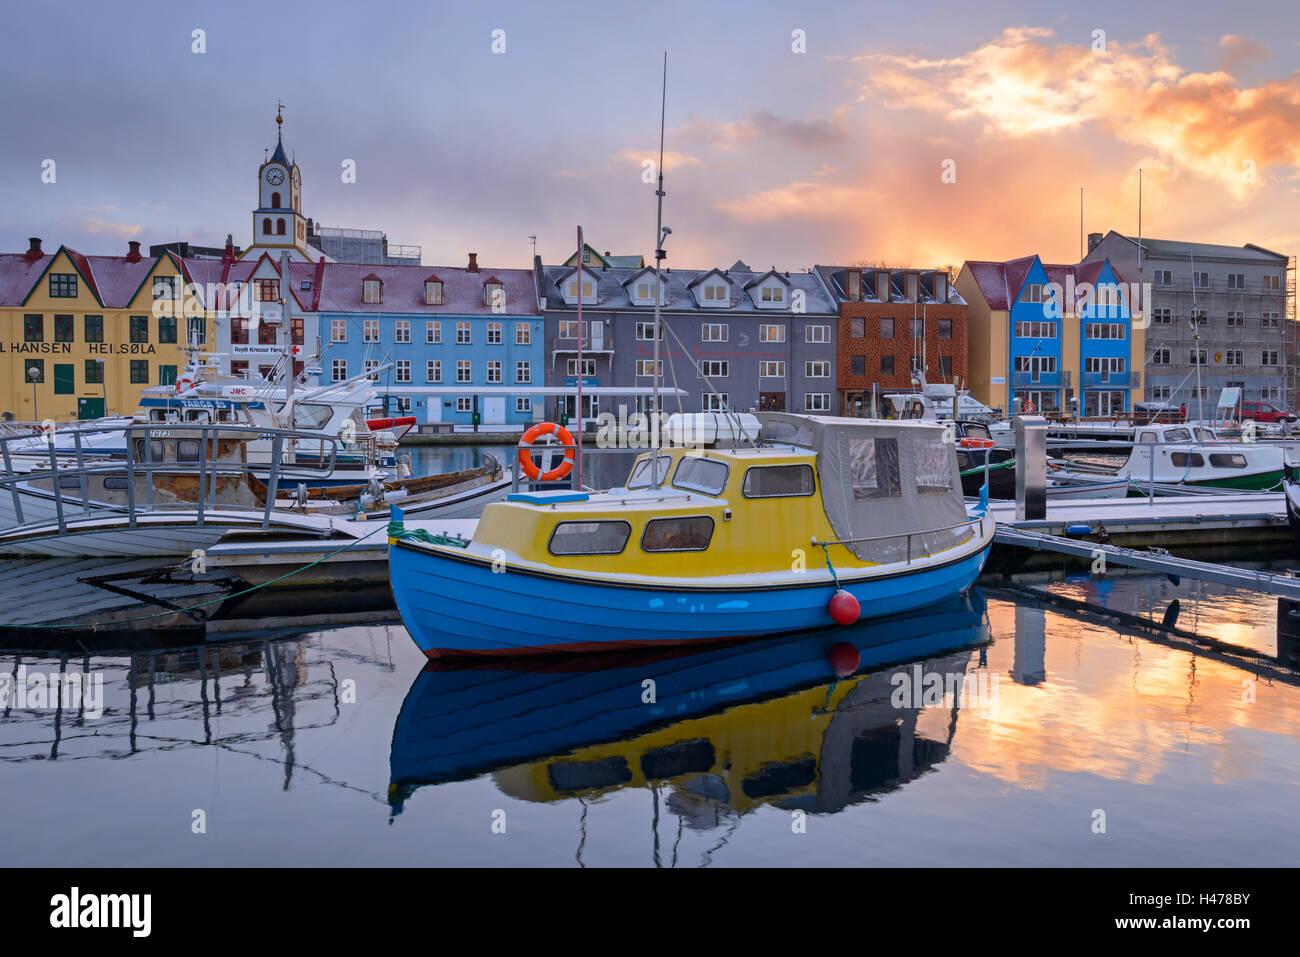 Boote in Tórshavn Hafen bei Sonnenaufgang, Färöer Inseln, Dänemark, Europa. Winter (April) 2015. Stockfoto